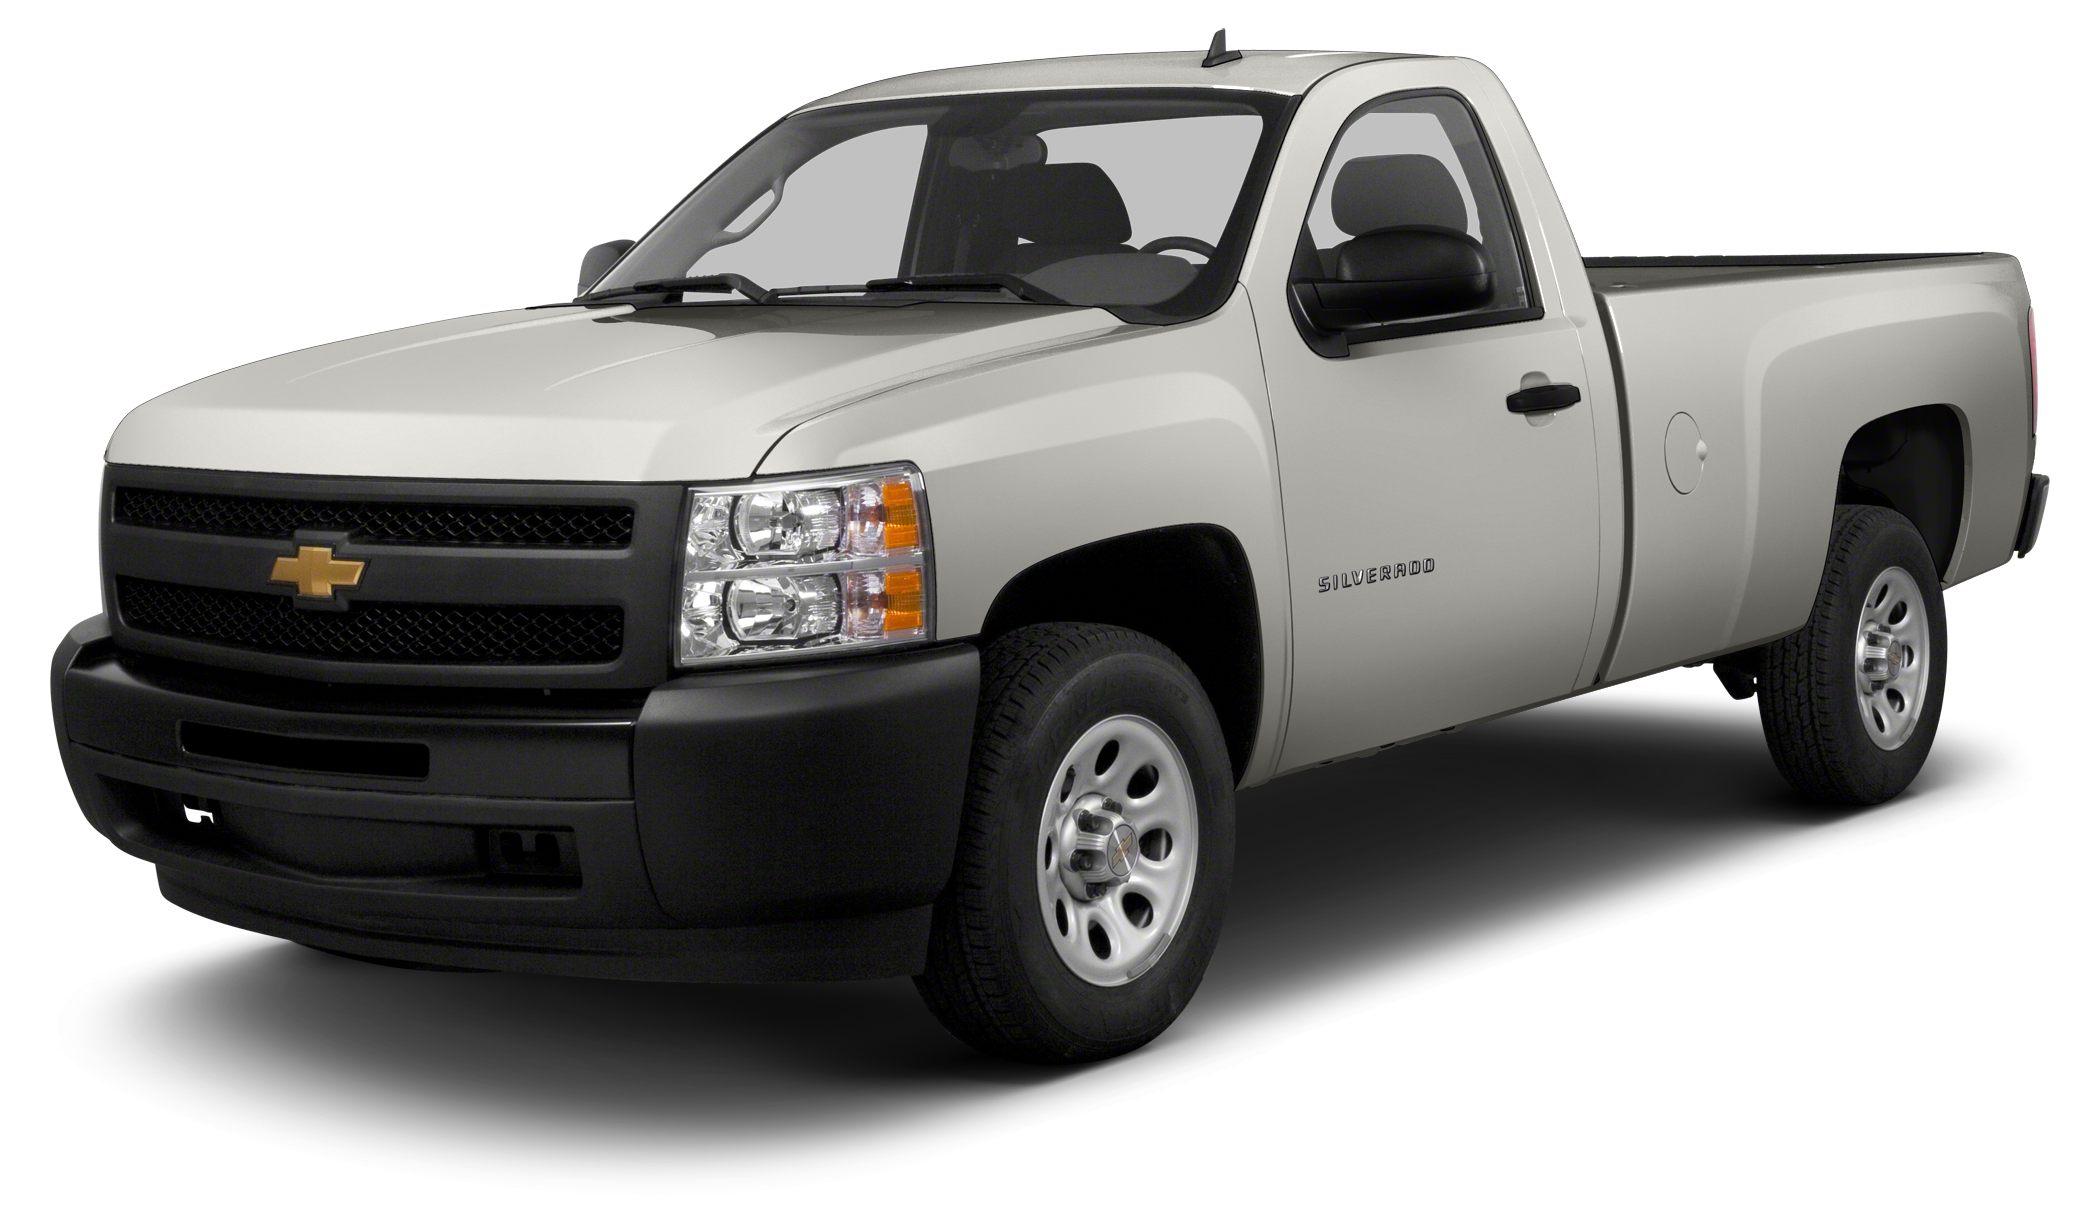 2013 Chevrolet Silverado 1500 WT Miles 32035Color Summit White Stock 155911 VIN 1GCNCPEX3DZ2